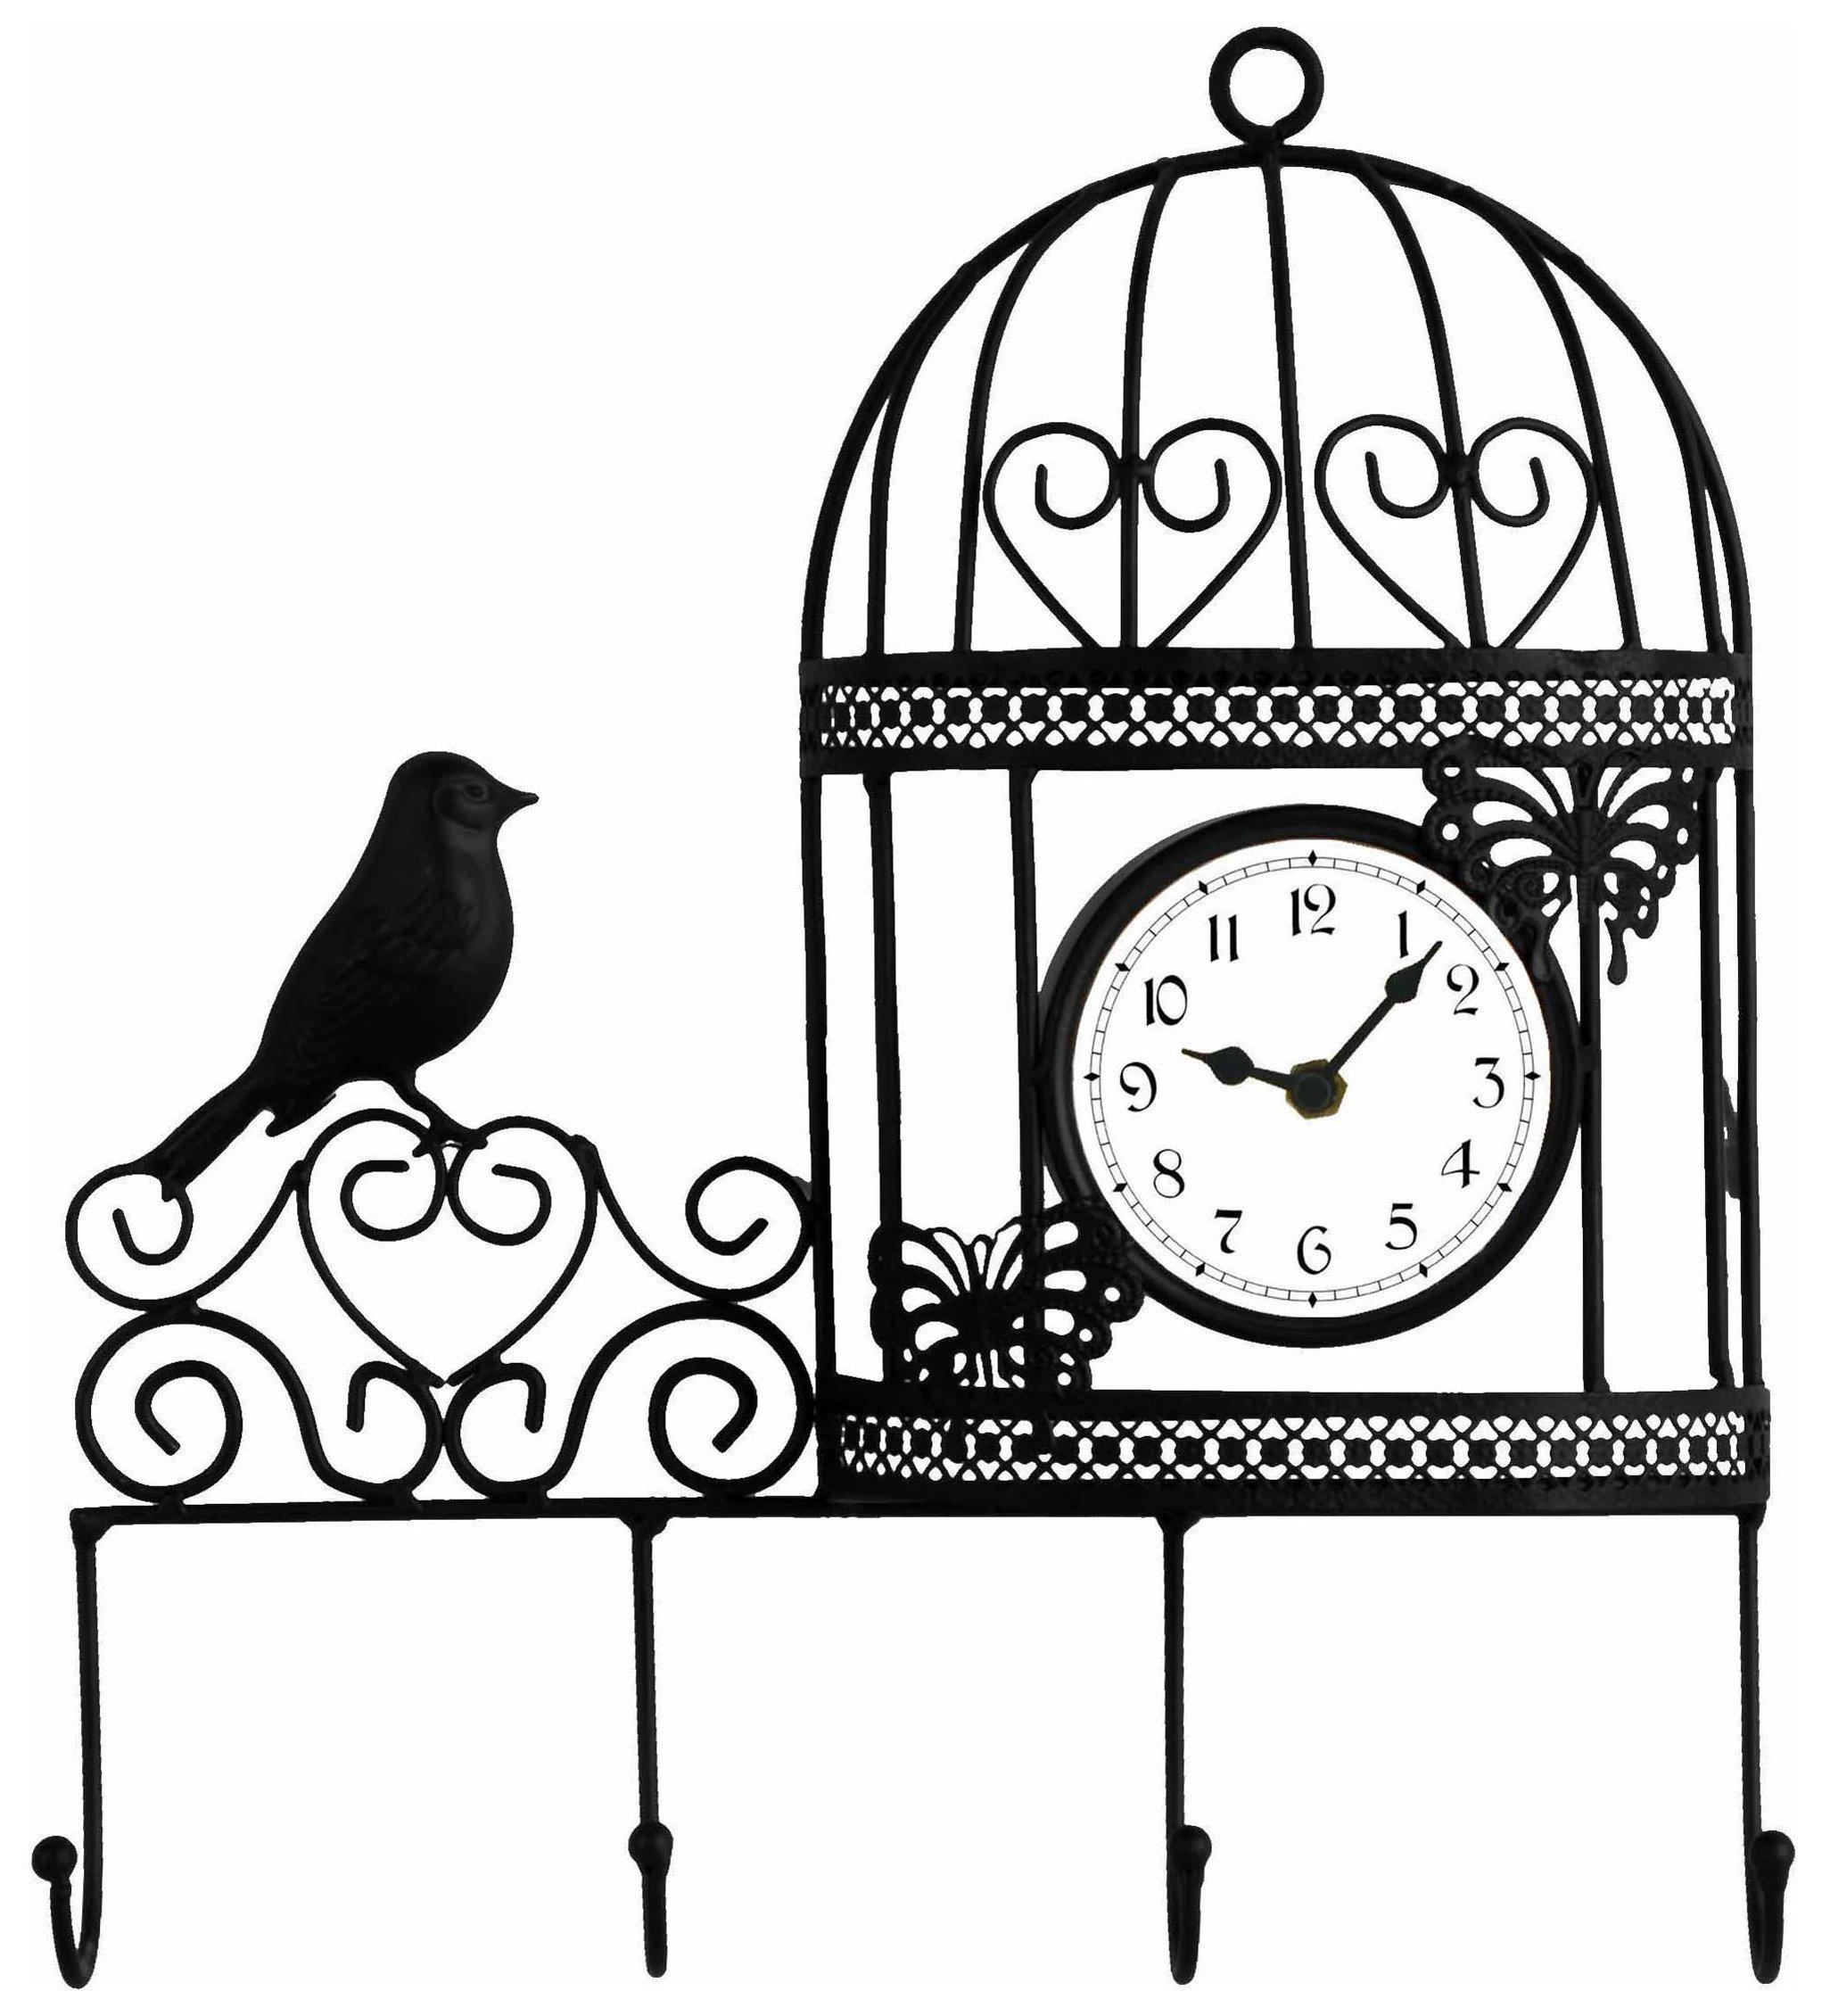 Black Kitchen Clock Argos: Decorative Wall Mounted Bird Cage Wall Clock And Coat Hanger